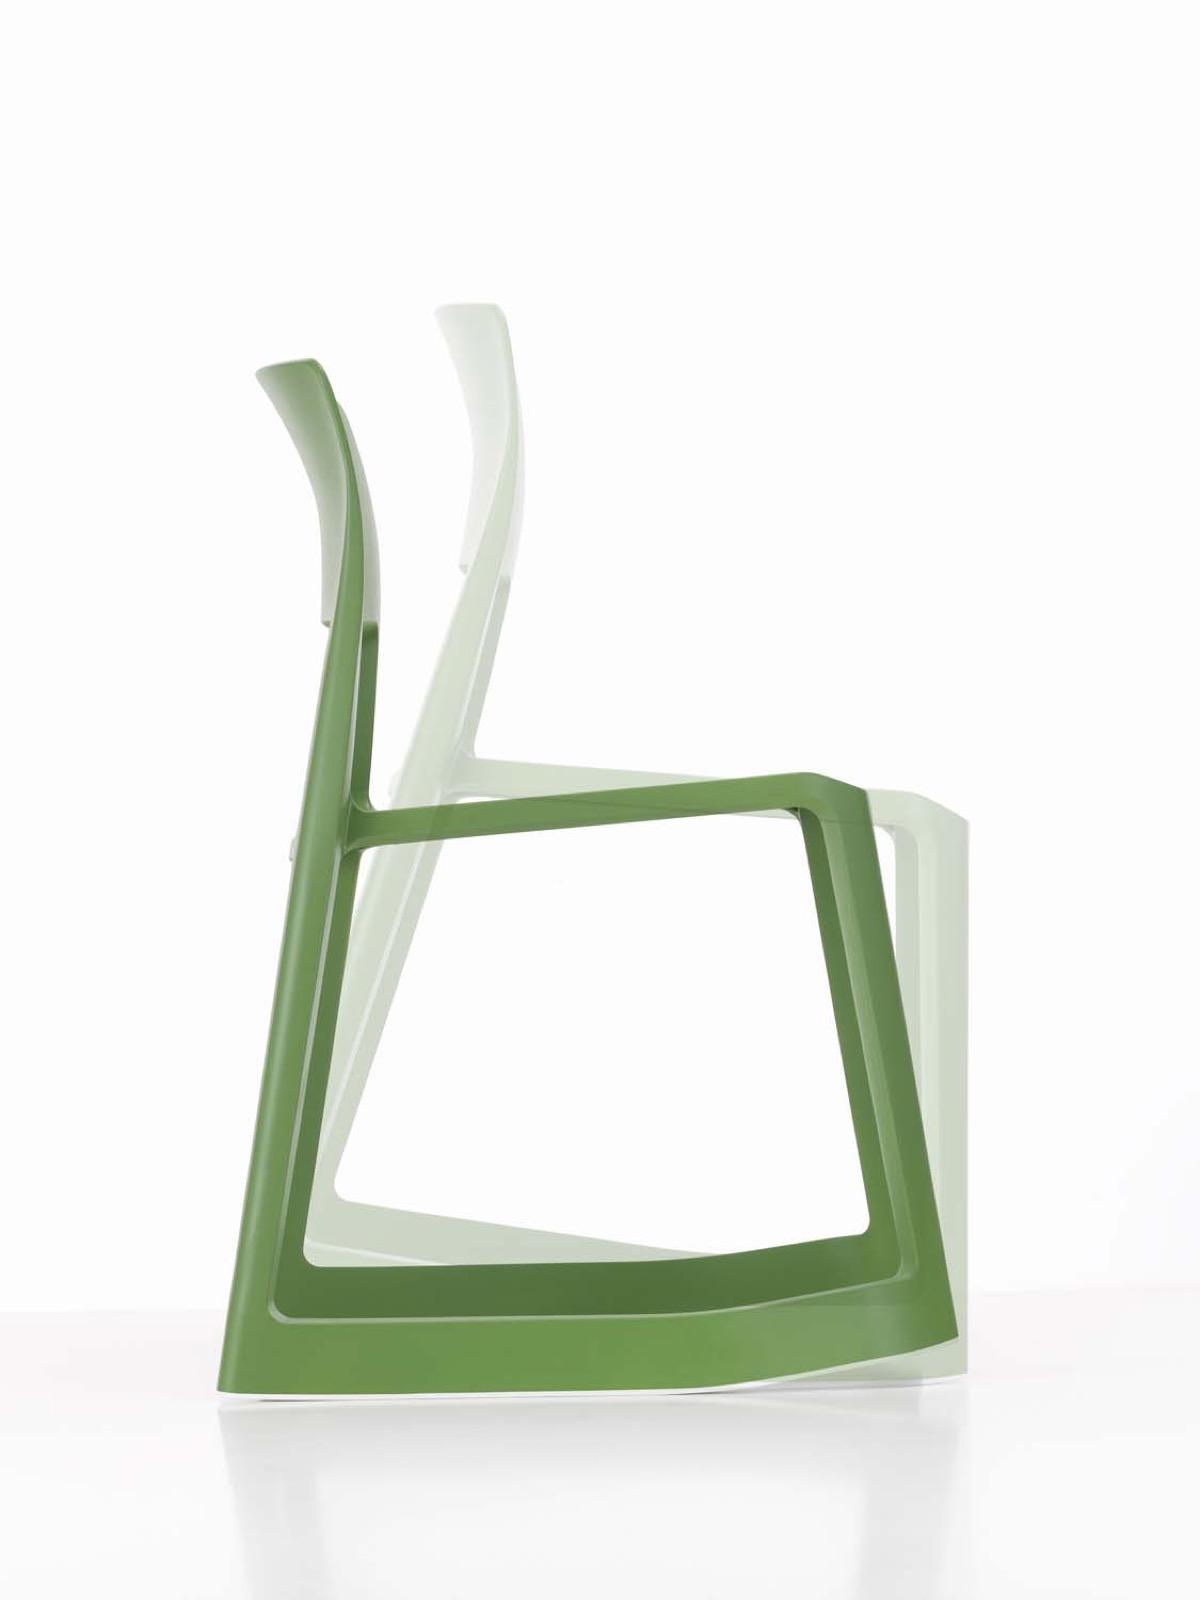 vitra tip ton schommelstoel matser wageningen. Black Bedroom Furniture Sets. Home Design Ideas